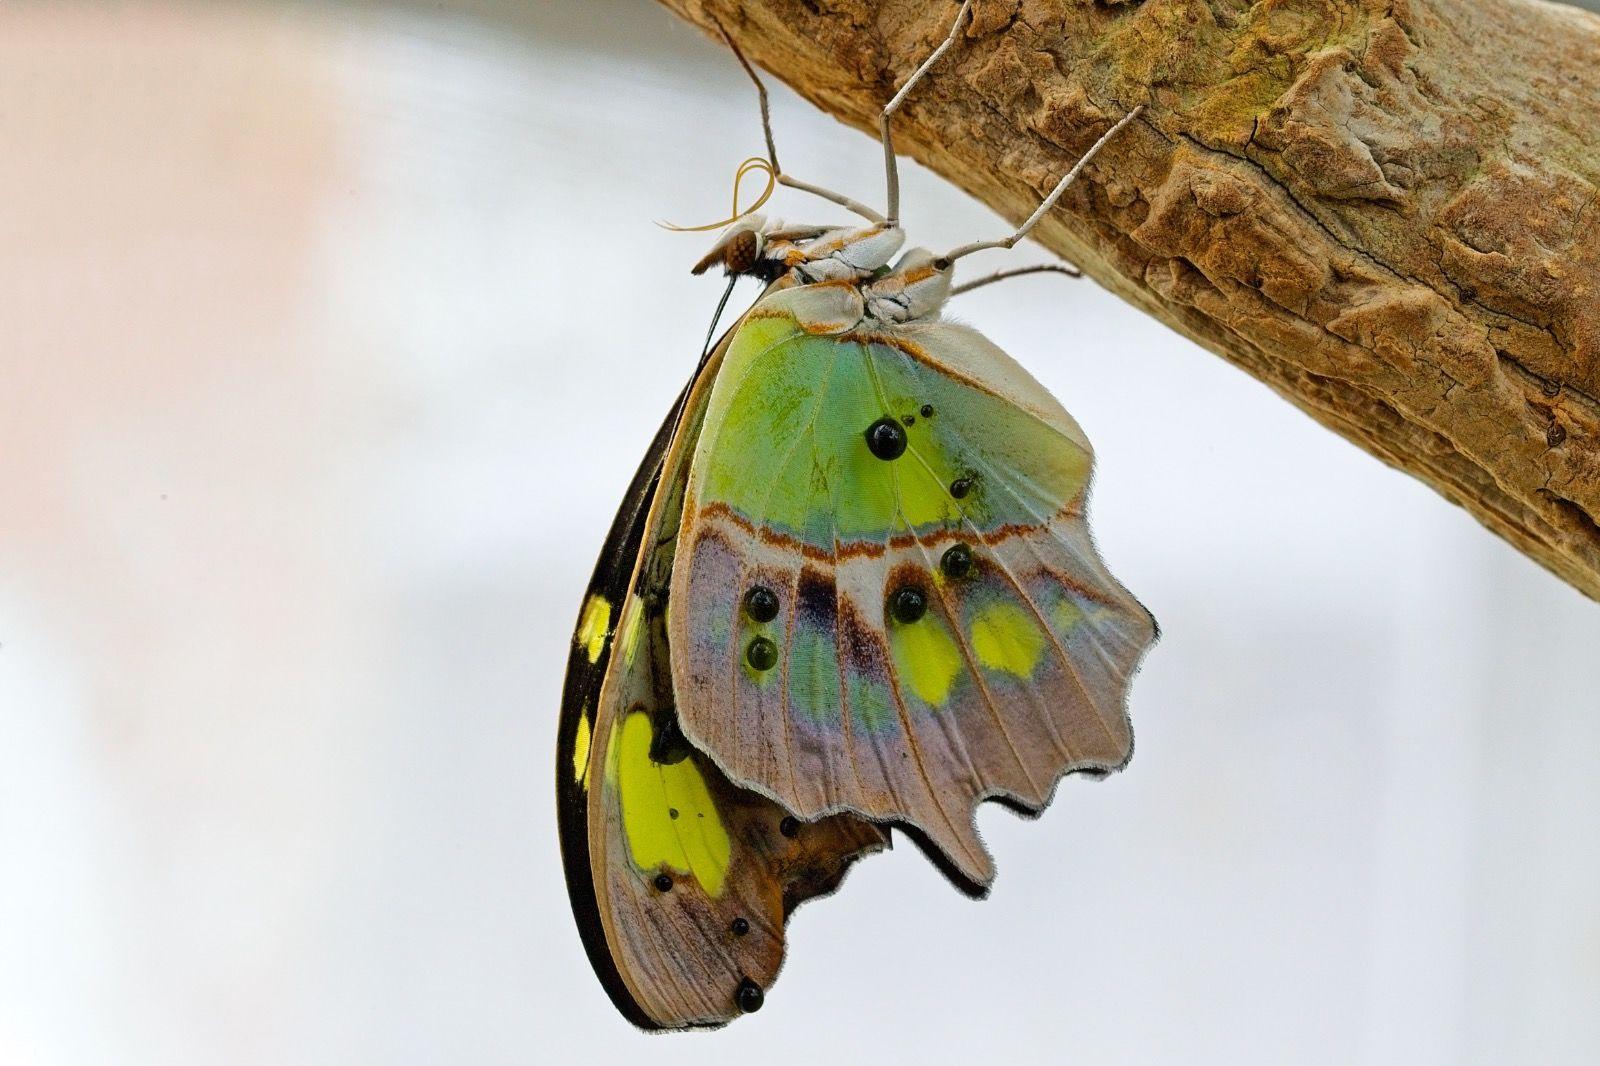 The Malachite Stratford Butterfly Farm